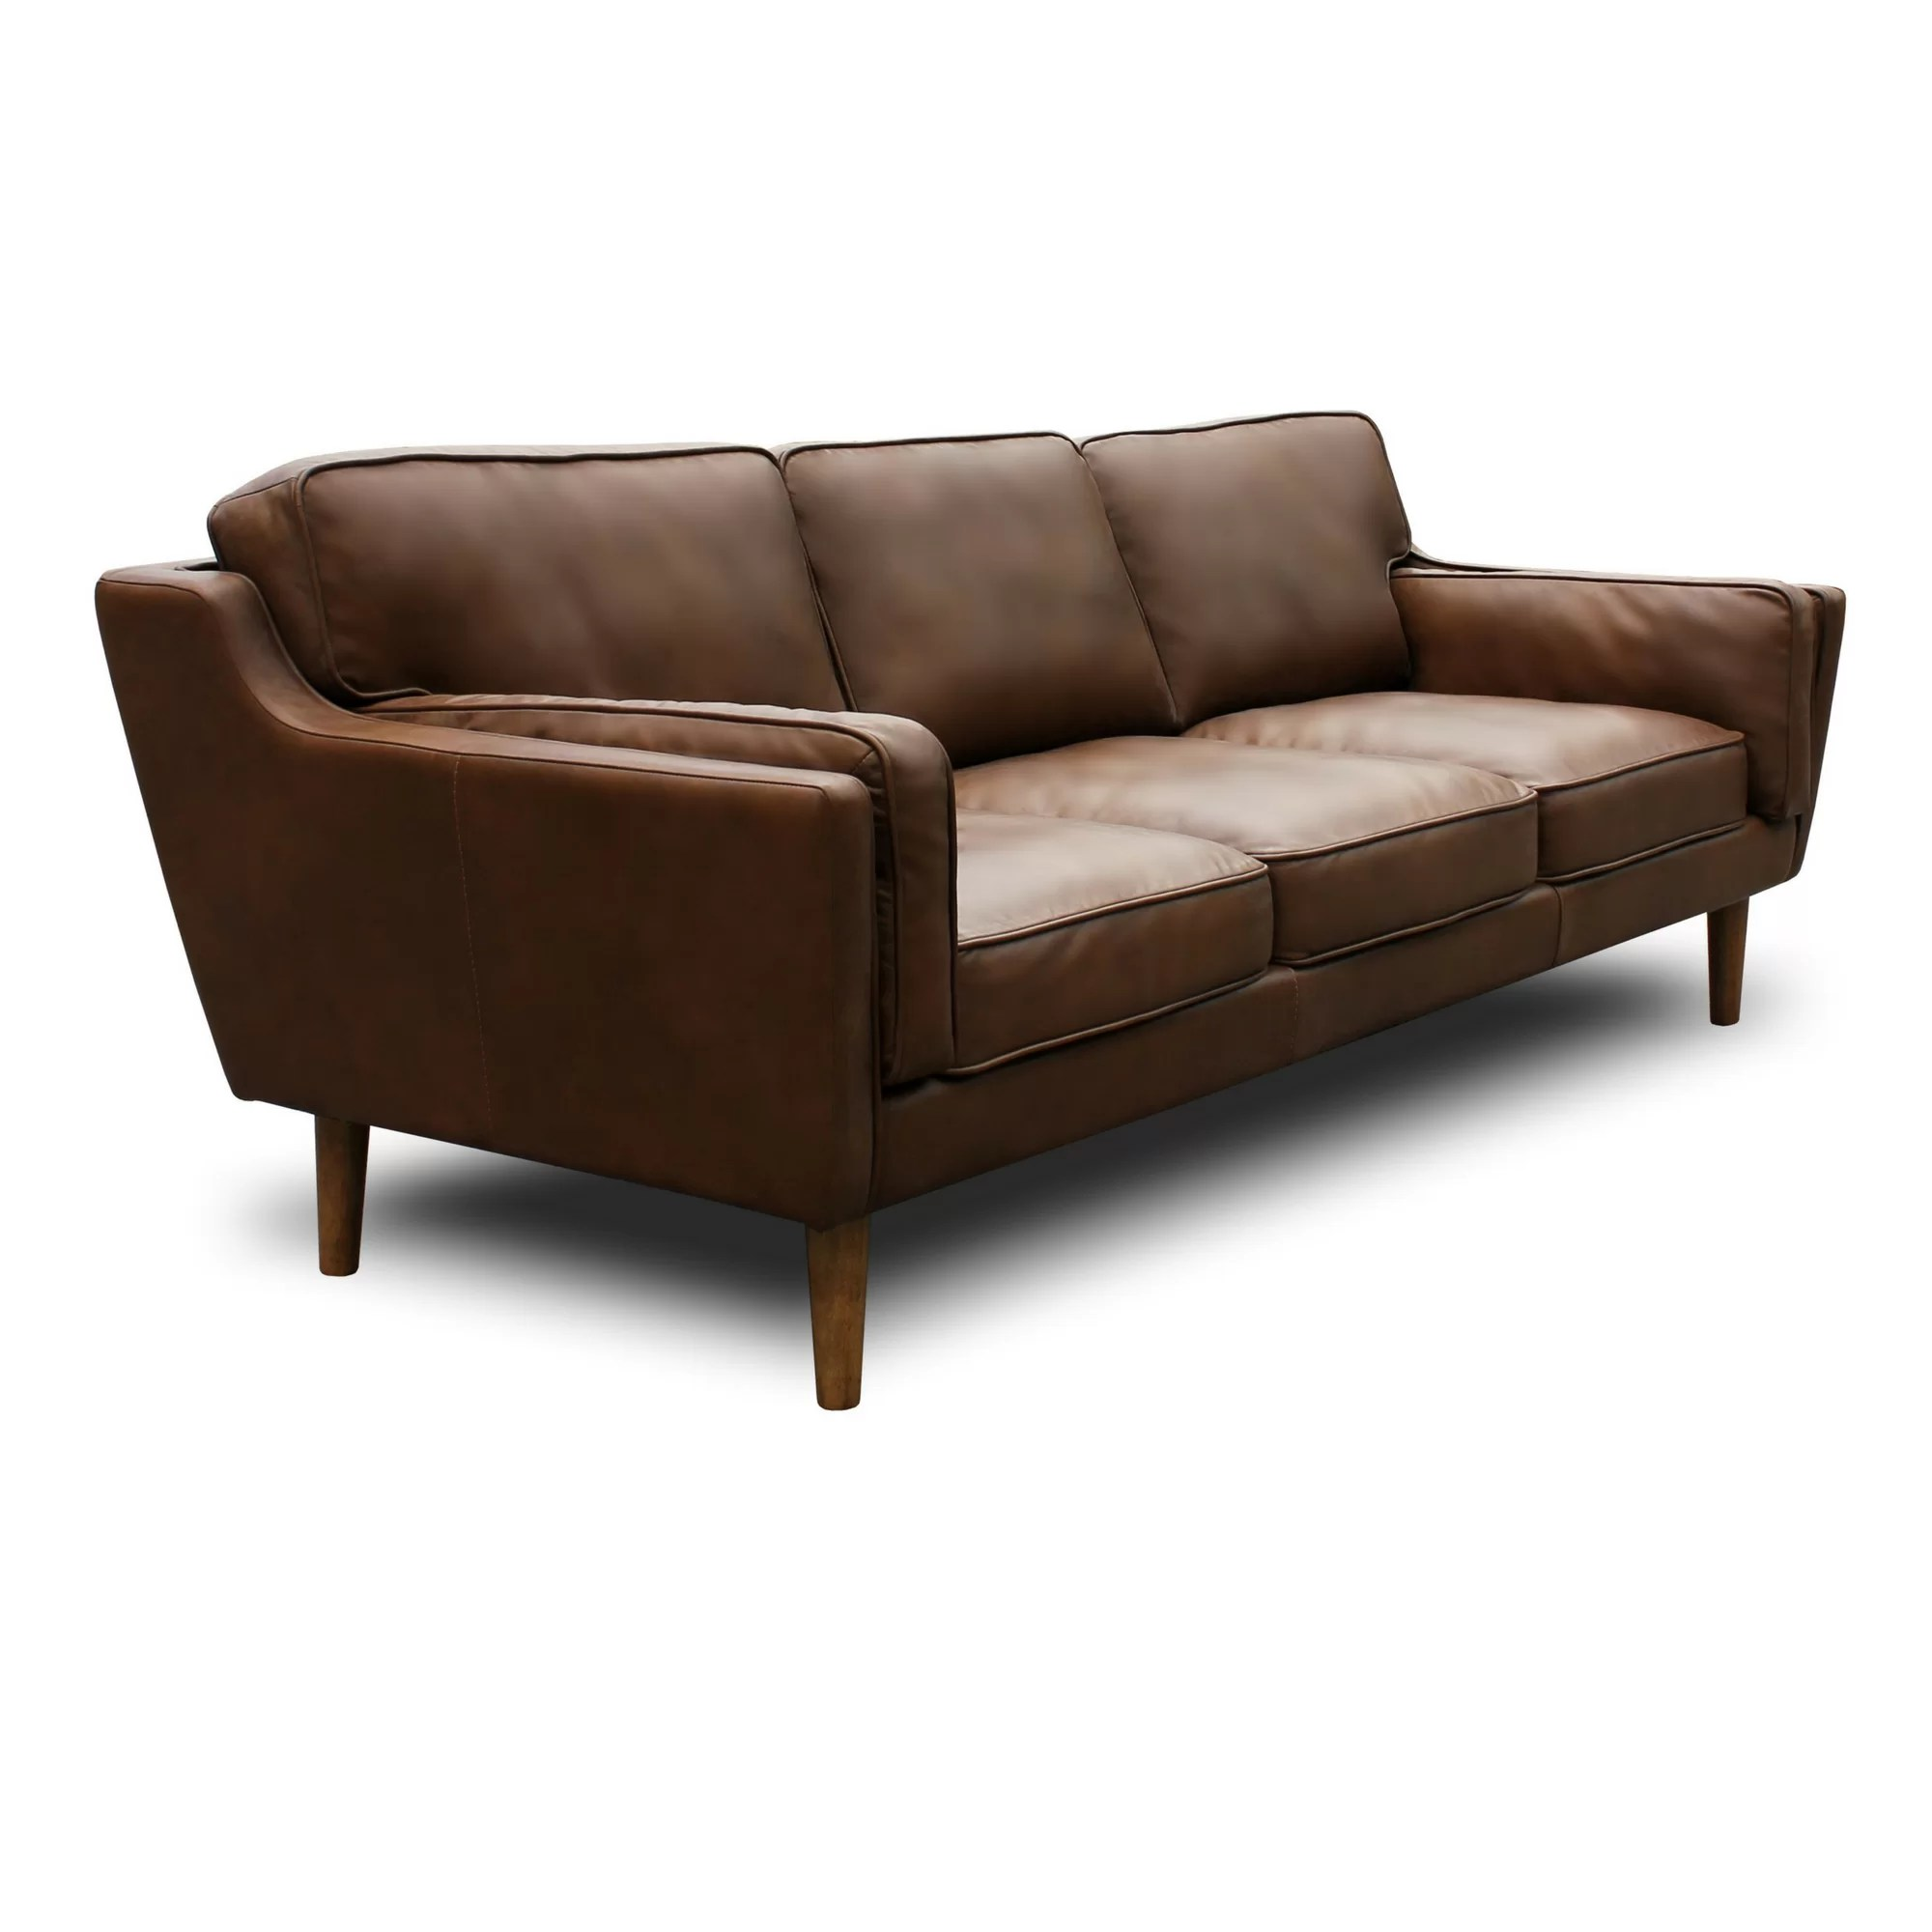 modern brown leather sofa natuzzi sleeper union rustic kaufman mid century reviews wayfair ca